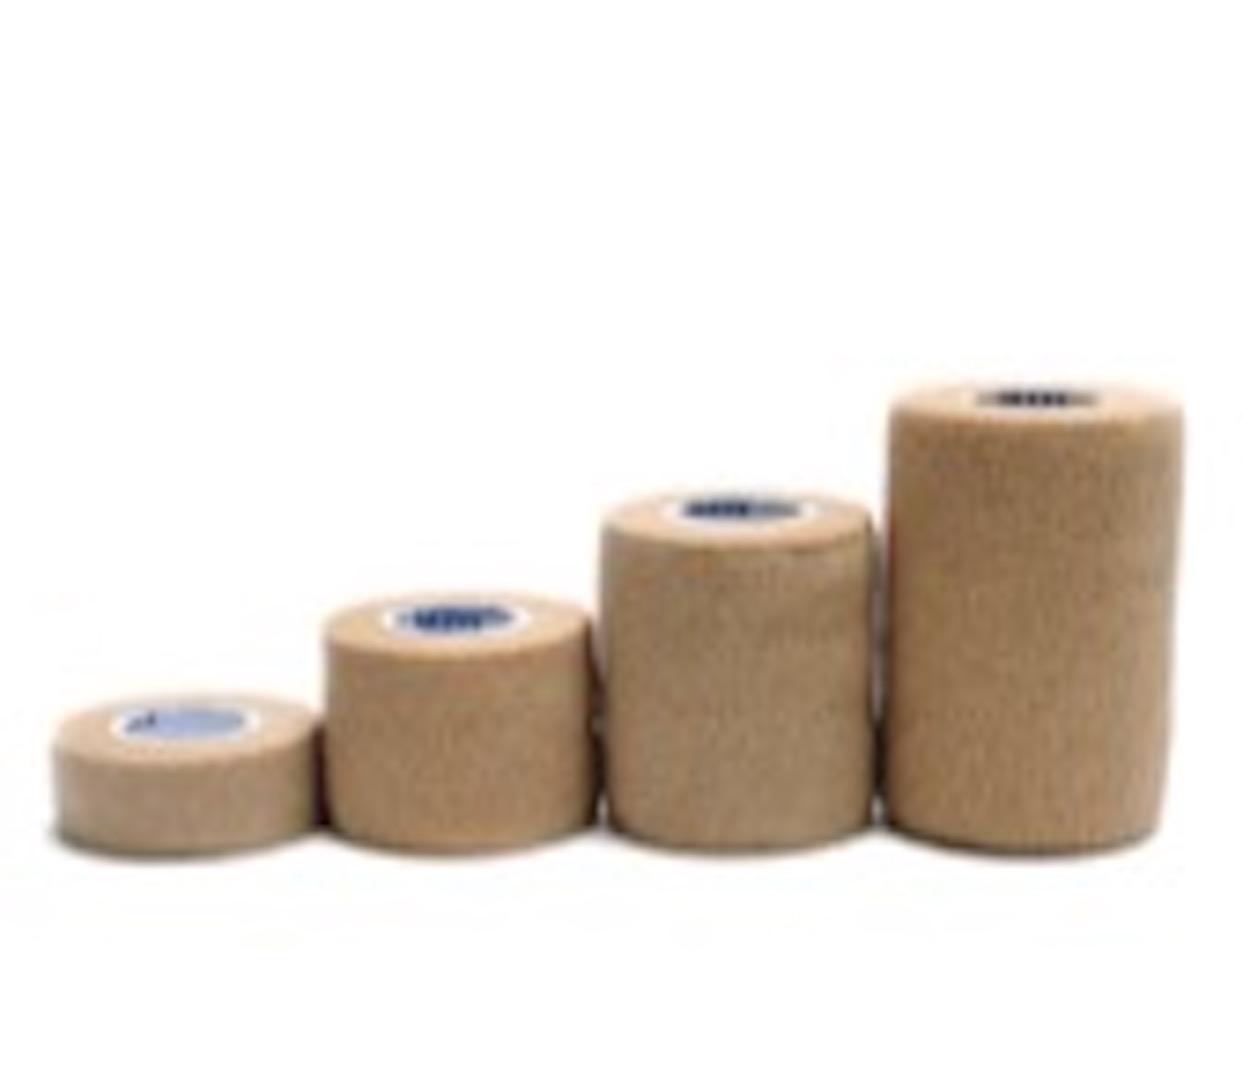 Cohesive Bandage, Natural Rubber Latex, Non-woven, Spandex, Tan